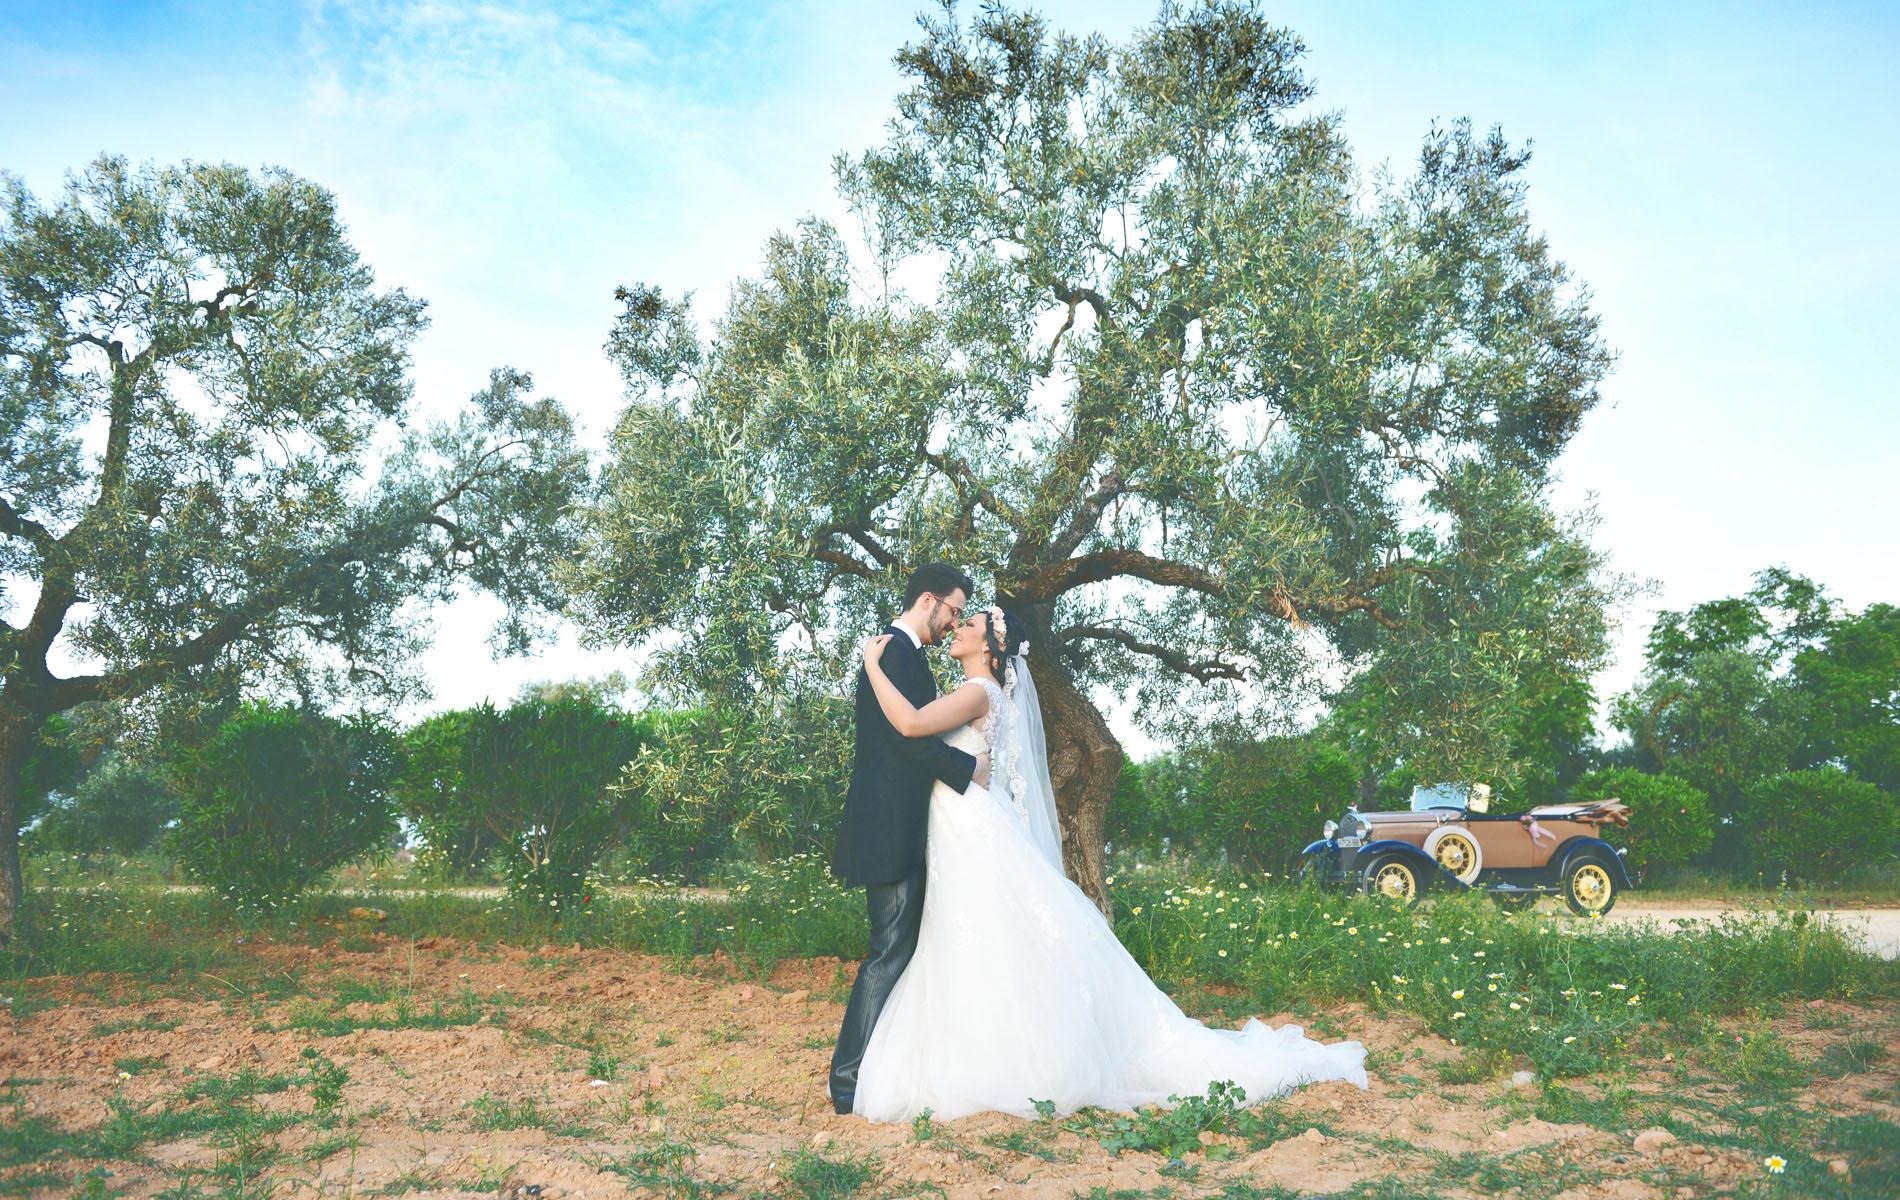 bodakids fotografos de boda (2)